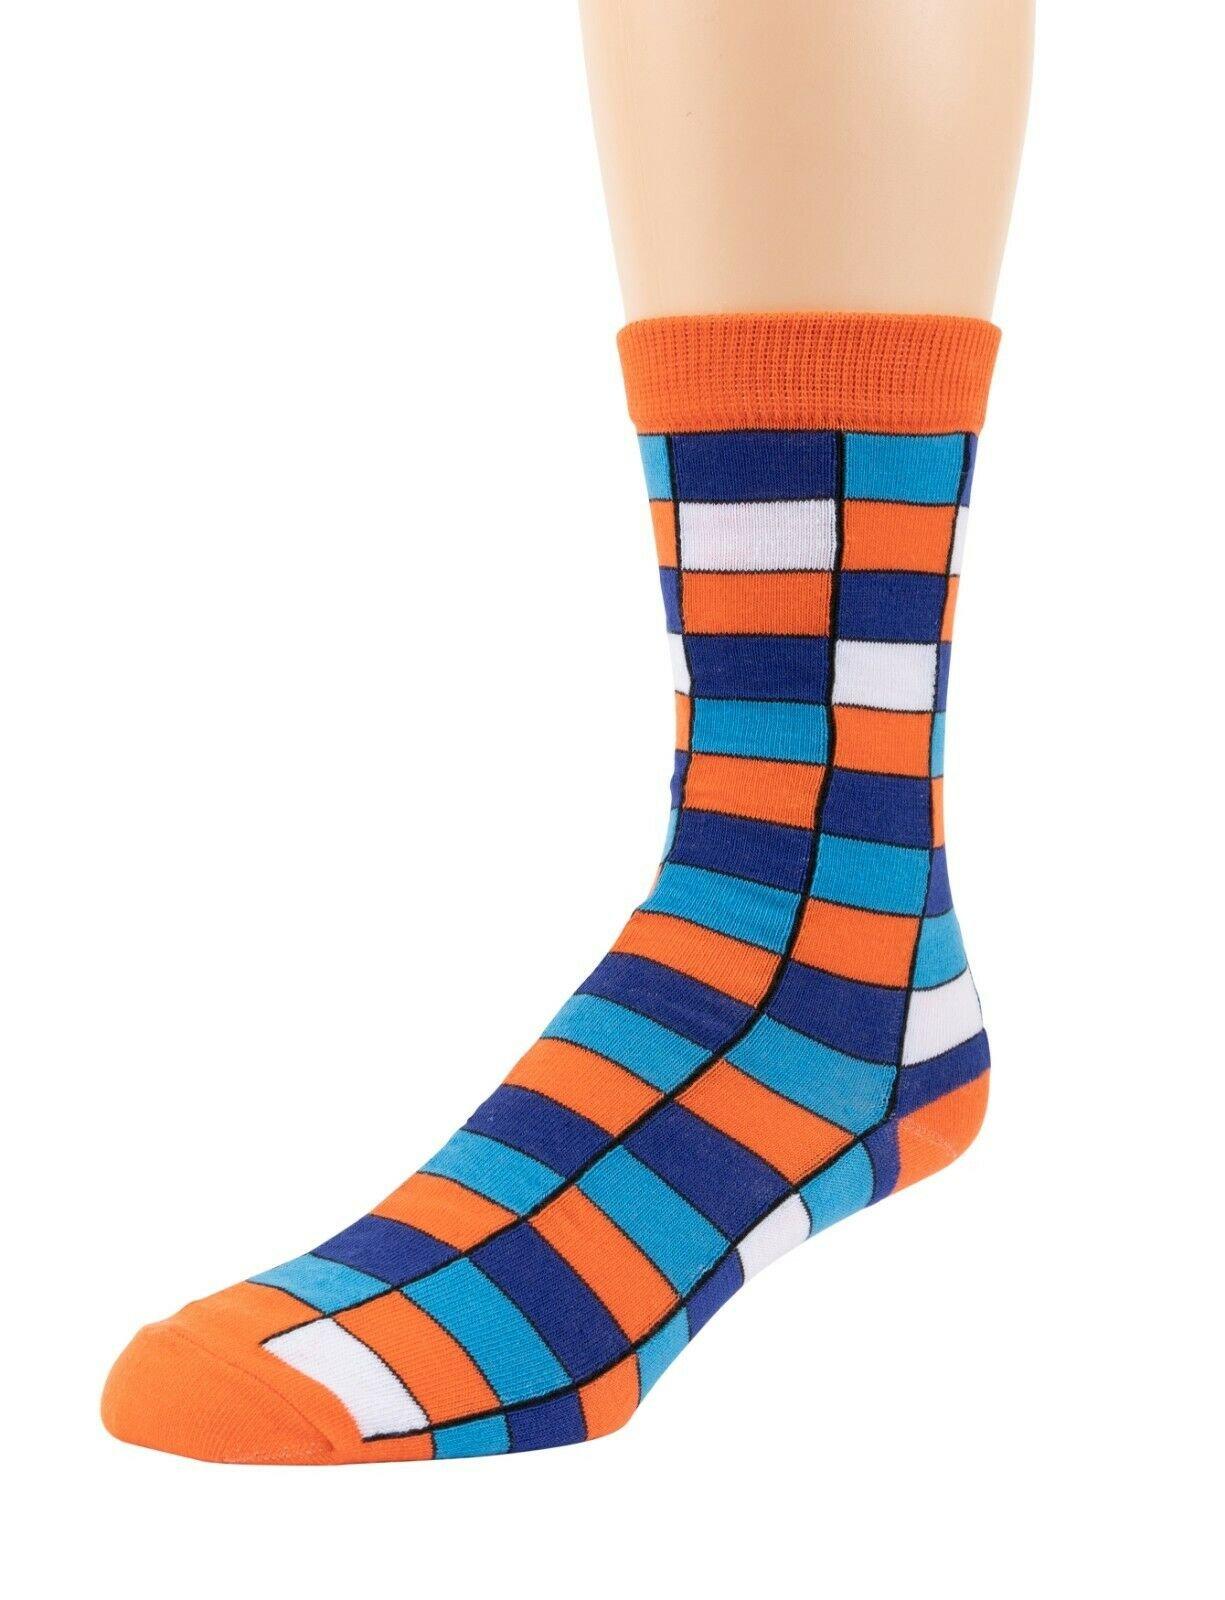 Mitch-Bogen-Mens-Cotton-Dress-Socks-Colorful-Fashion-Crew-Socks-8-Pack-Gift-Box thumbnail 52